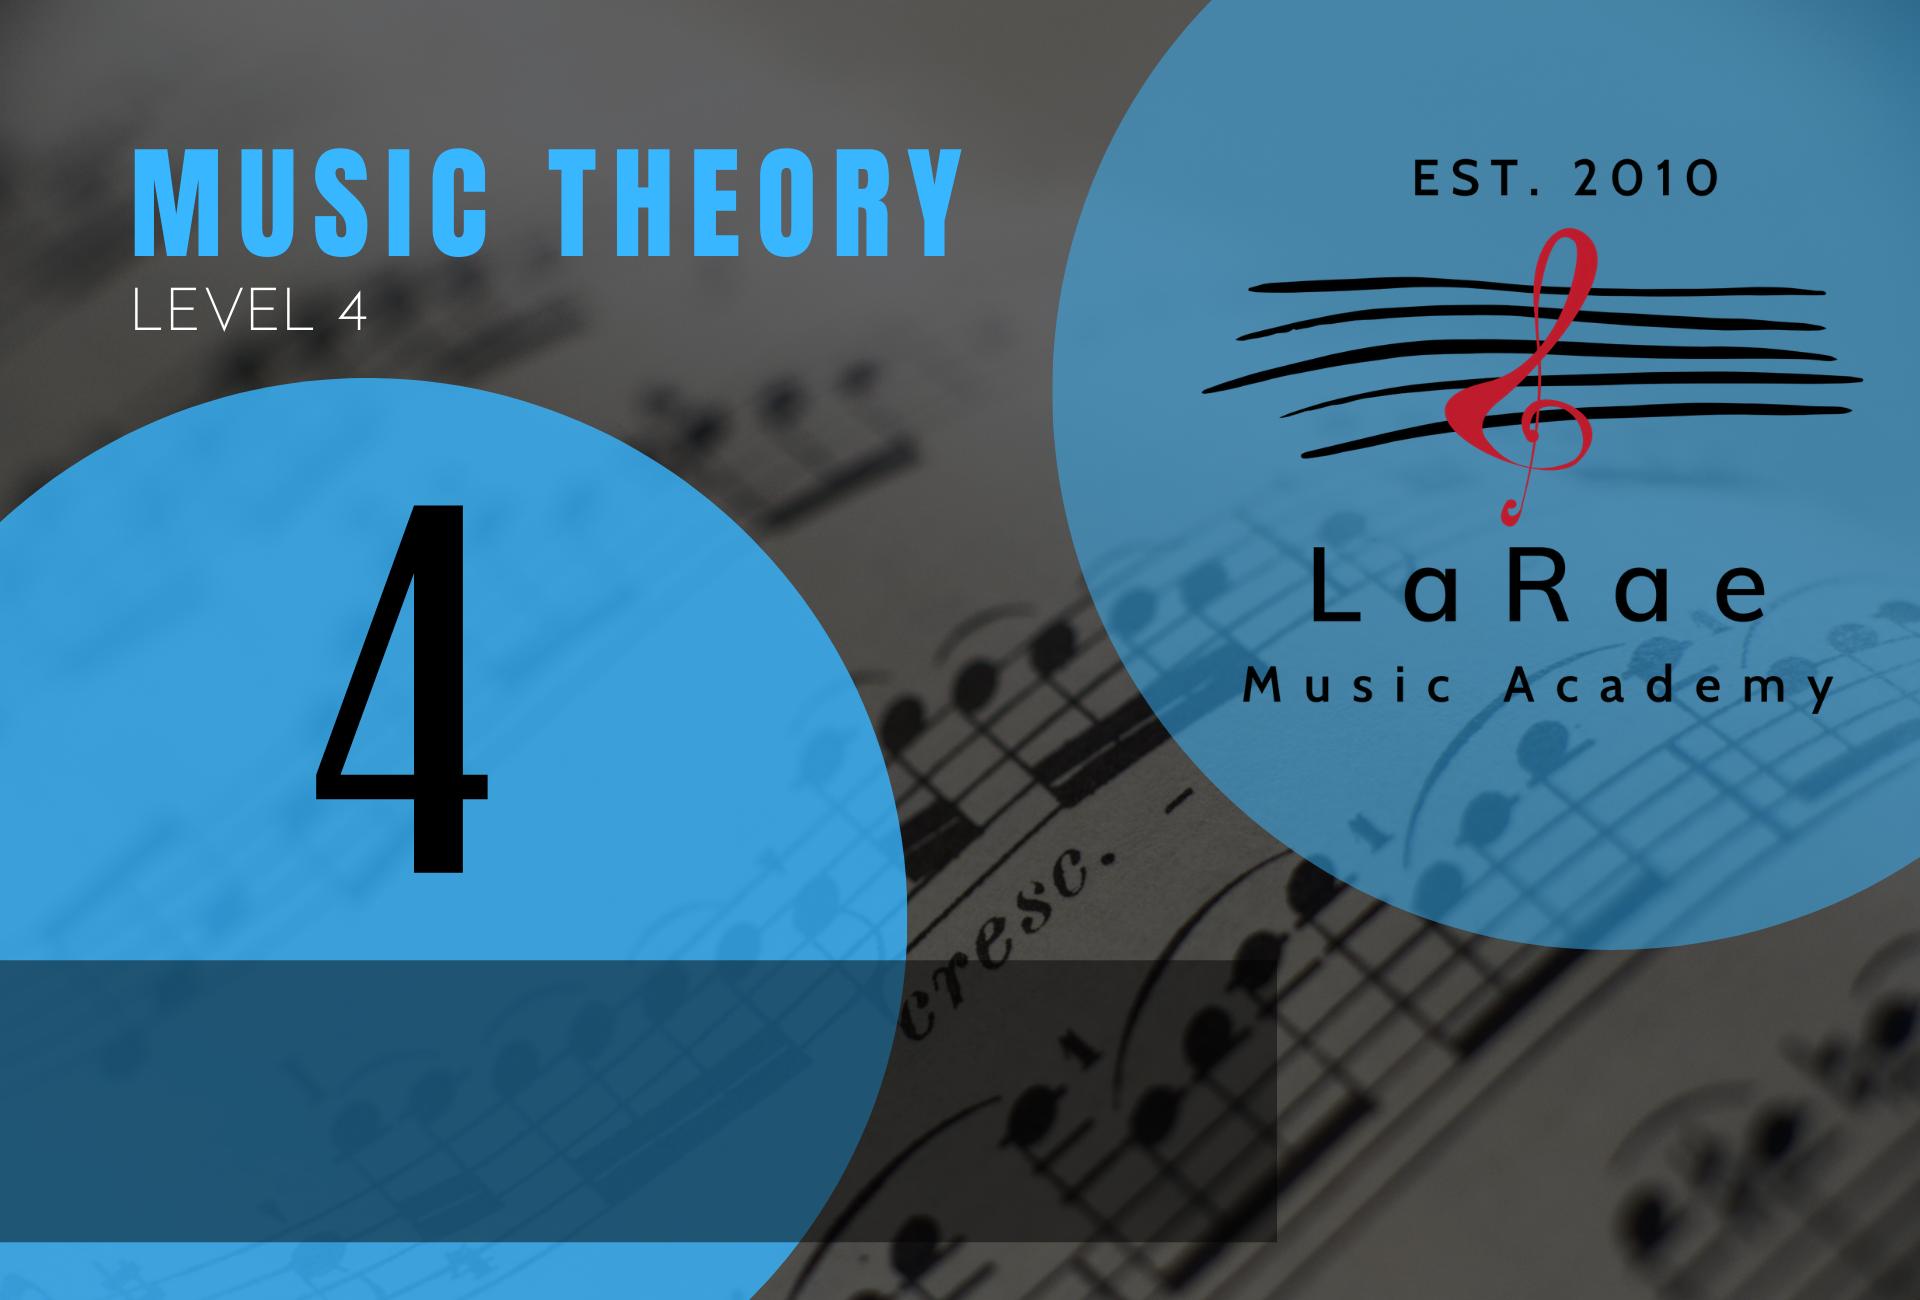 Music Theory Level 4